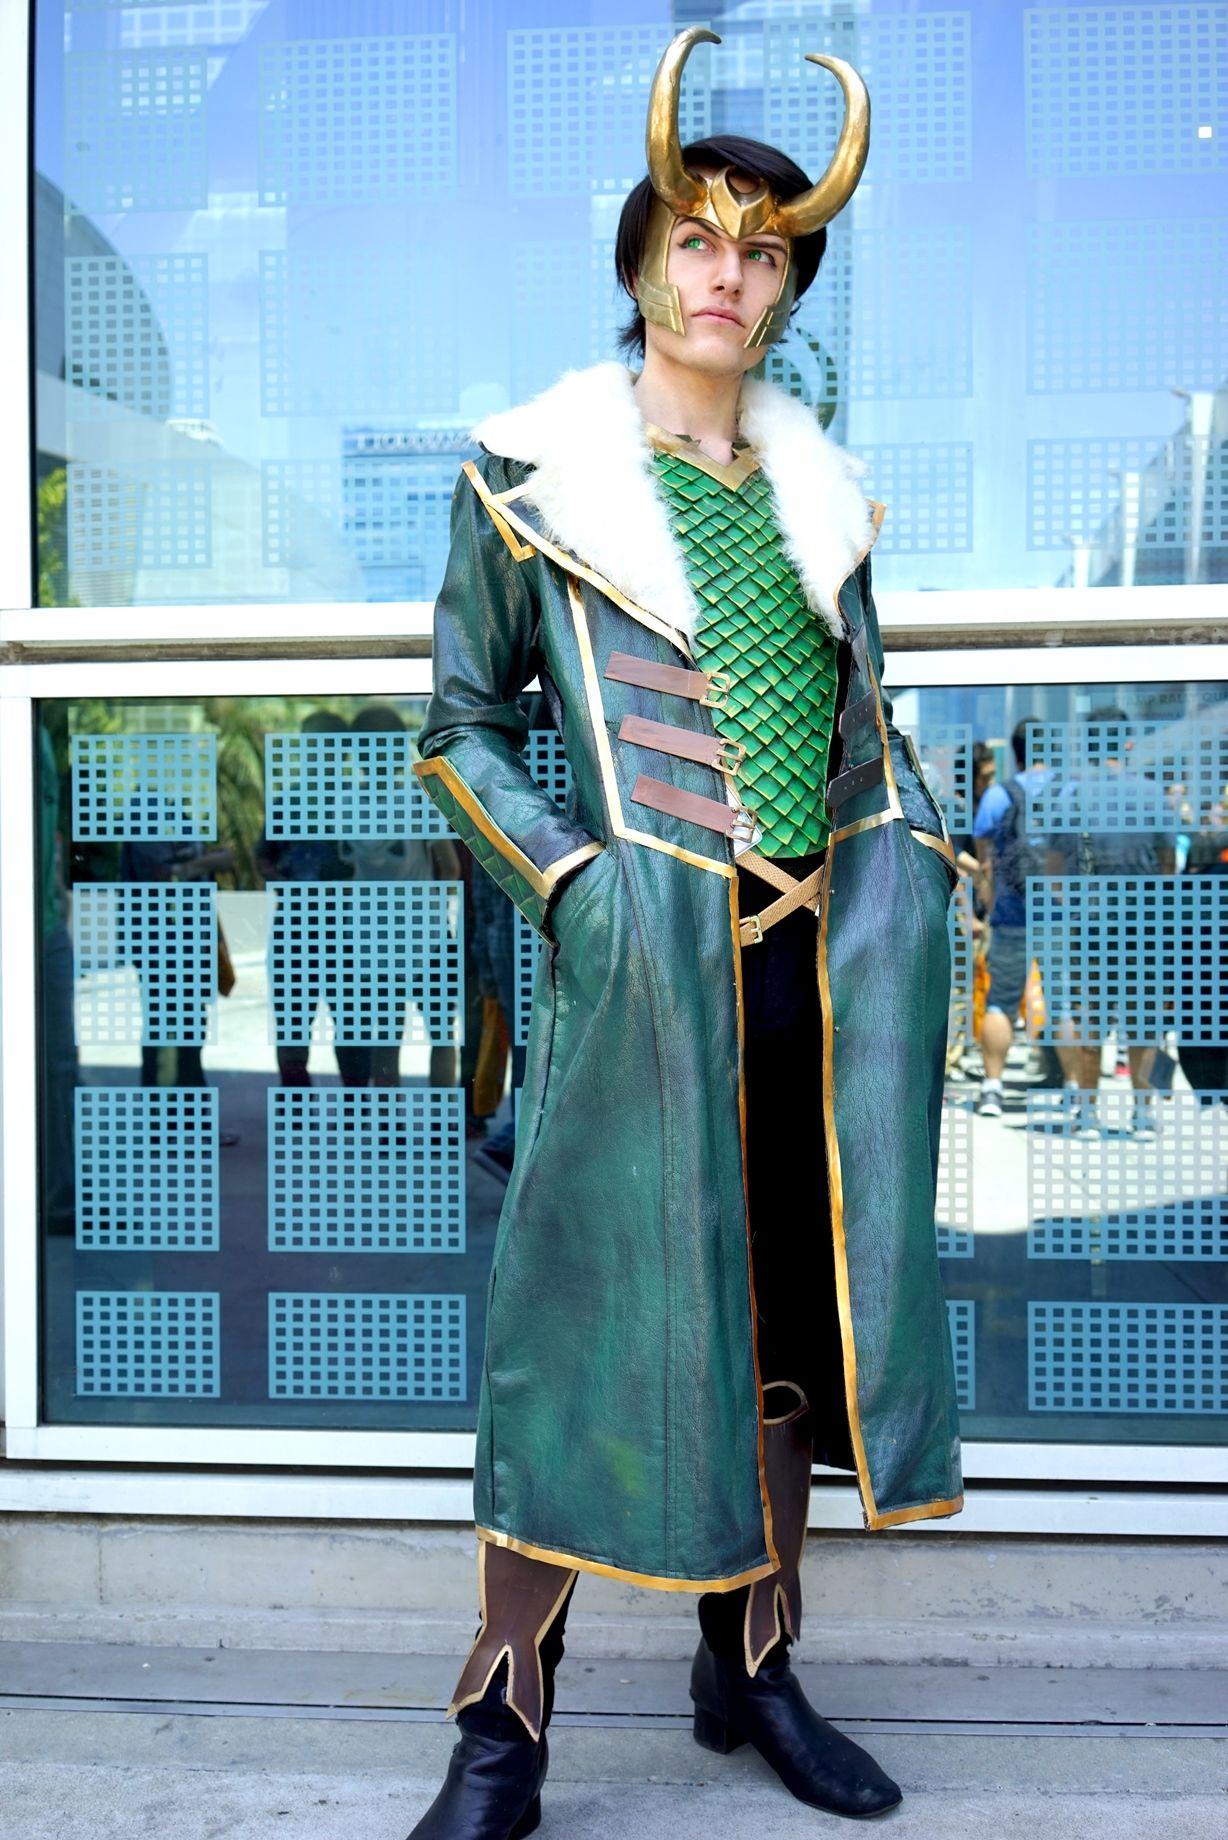 Aicosu Loki Cosplay Loki Costume Amazing Cosplay